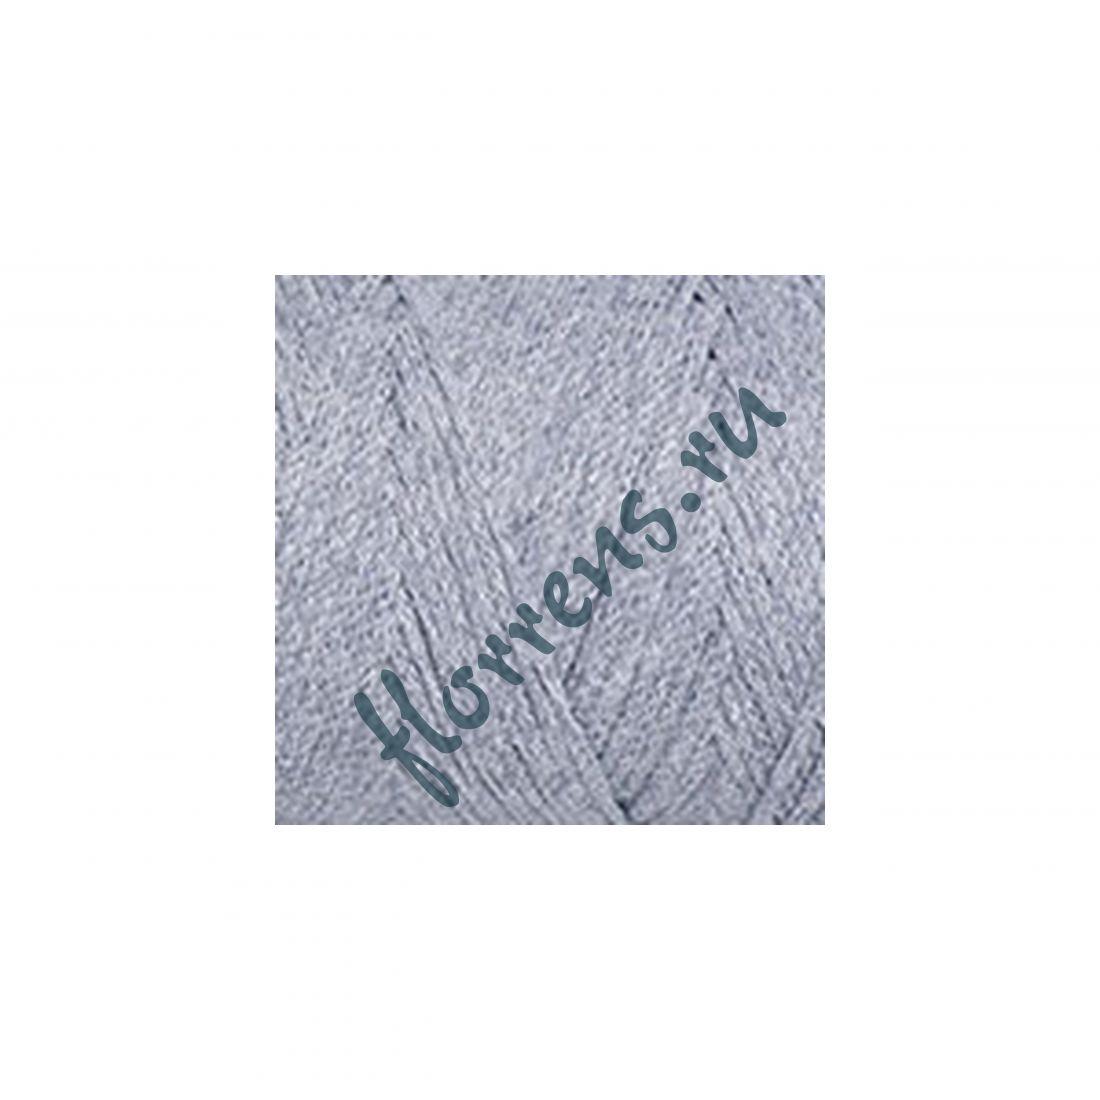 Пряжа Yarnart Macrame cotton / 783 св. серый меланж